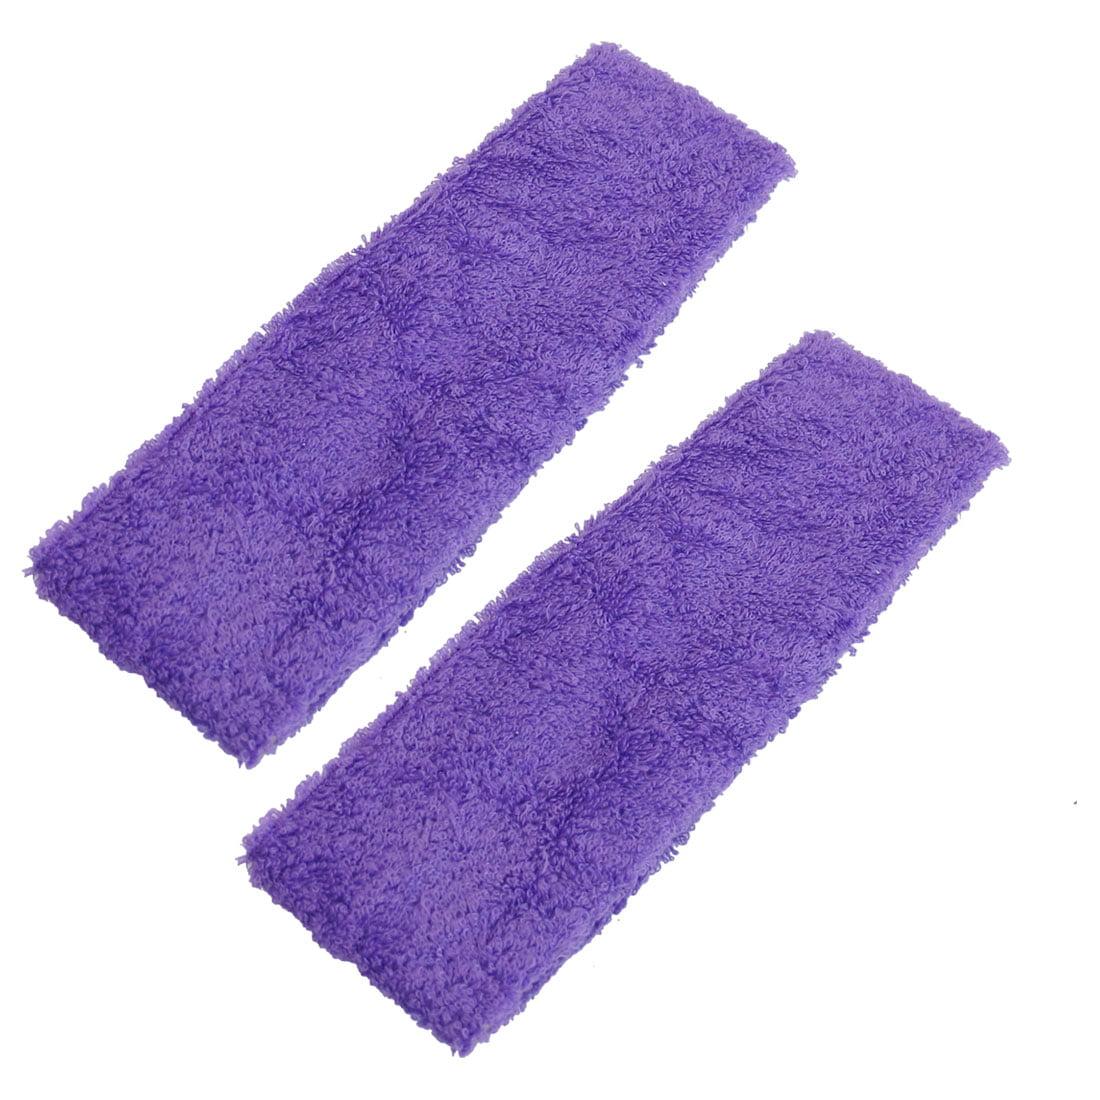 Unique BargainsWomen Bathing Face Washing Elastic Scarf Hair Band Purple 2 Pcs